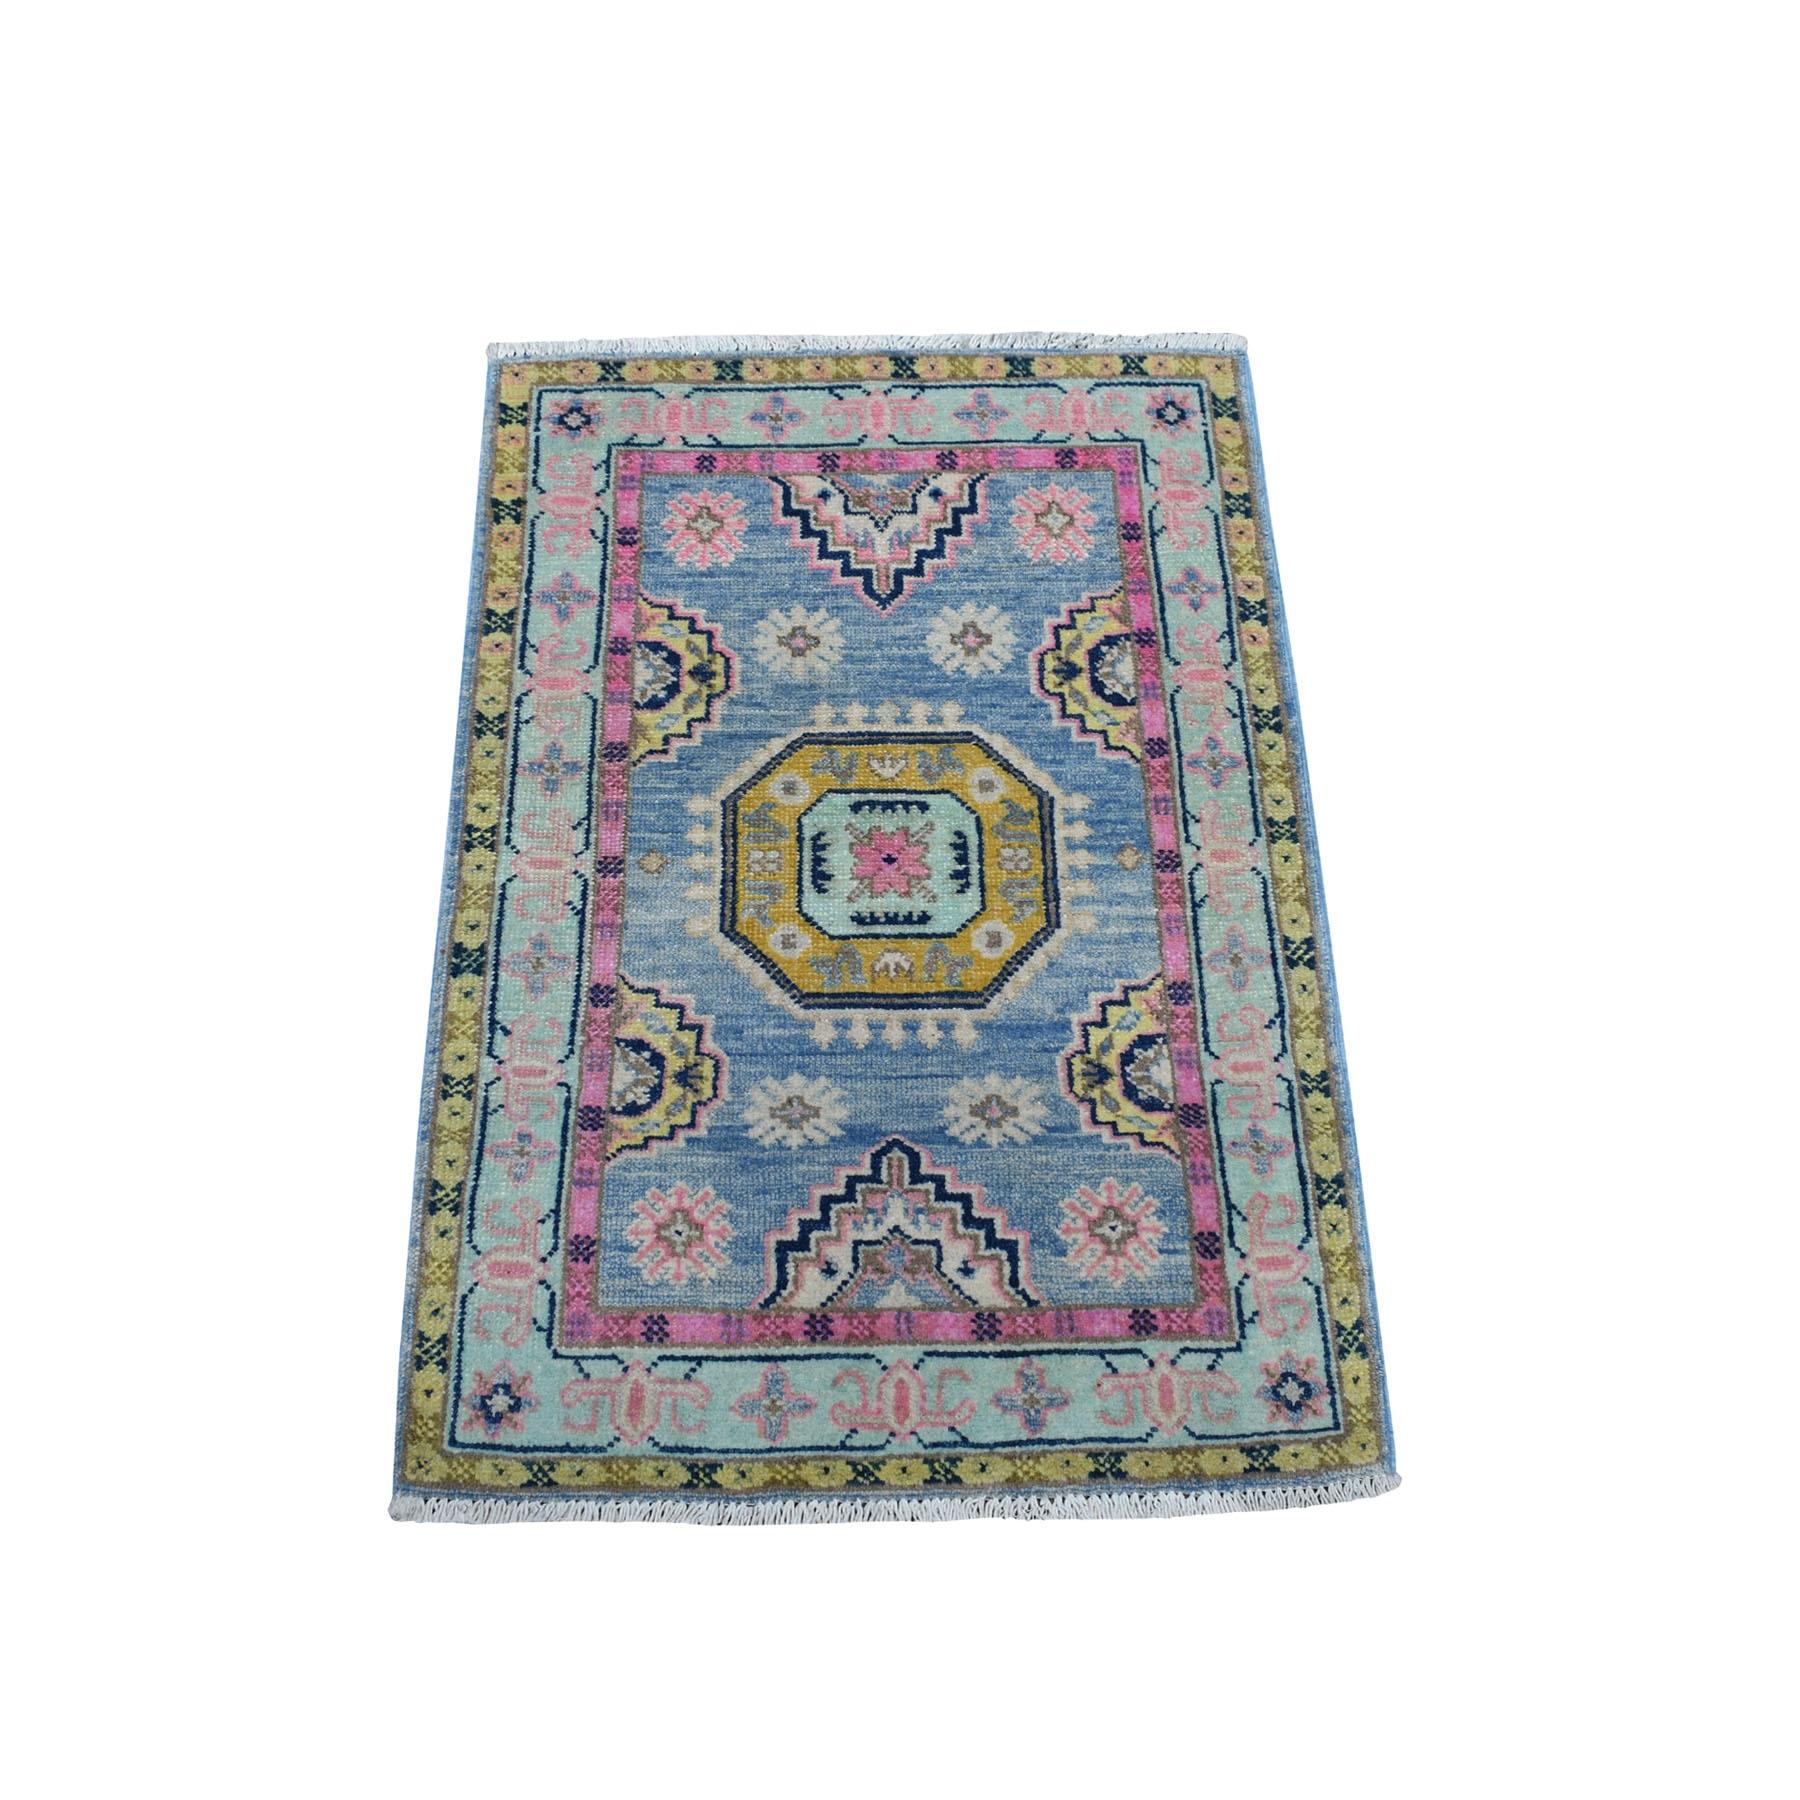 "2'1""X3' Colorful Blue Fusion Kazak Pure Wool Geometric Design Hand Knotted Oriental Rug moaec98b"